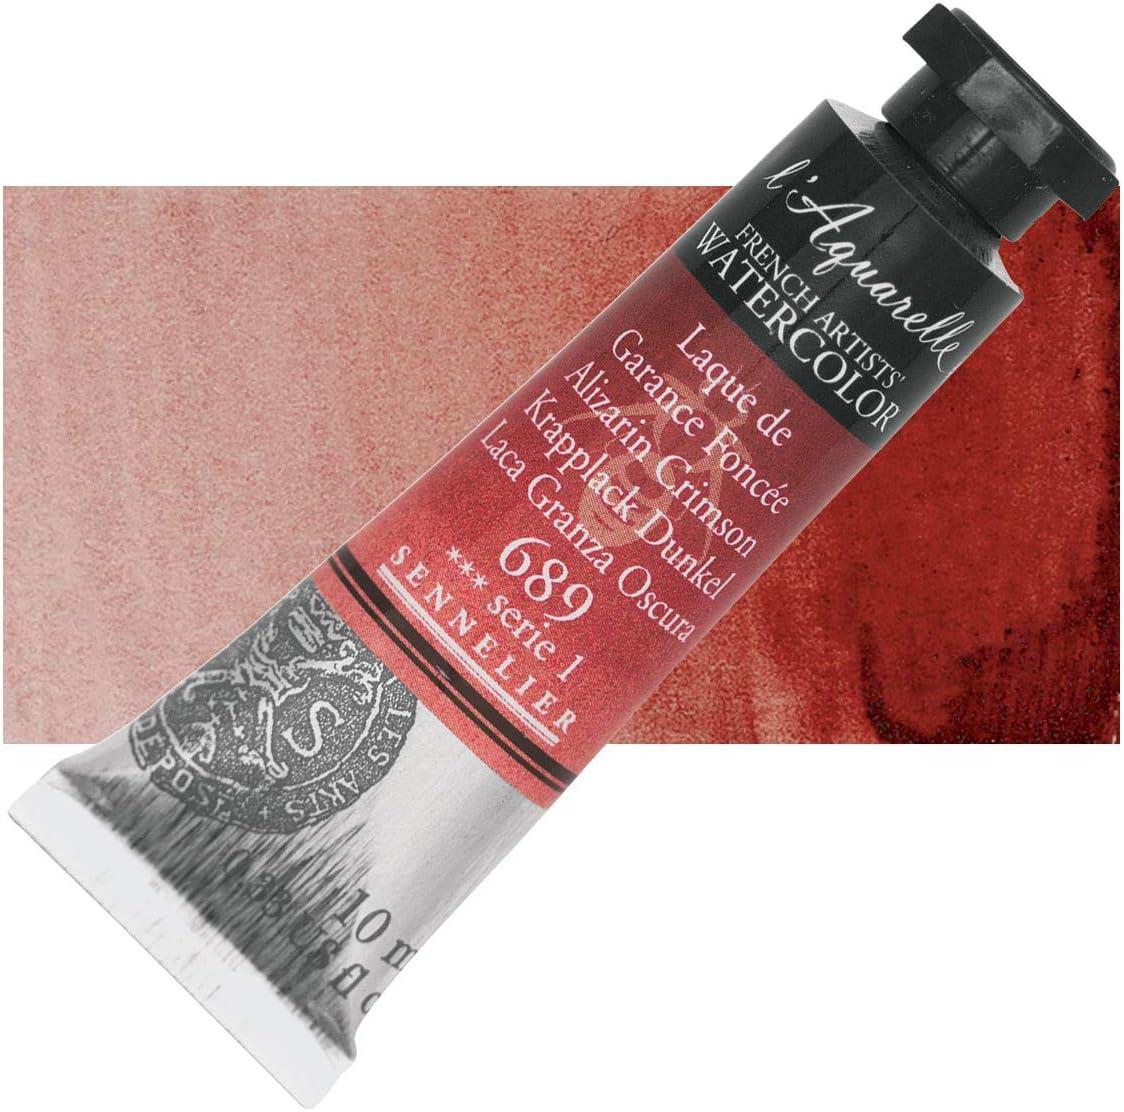 Crimson Lake Acrylic Paint